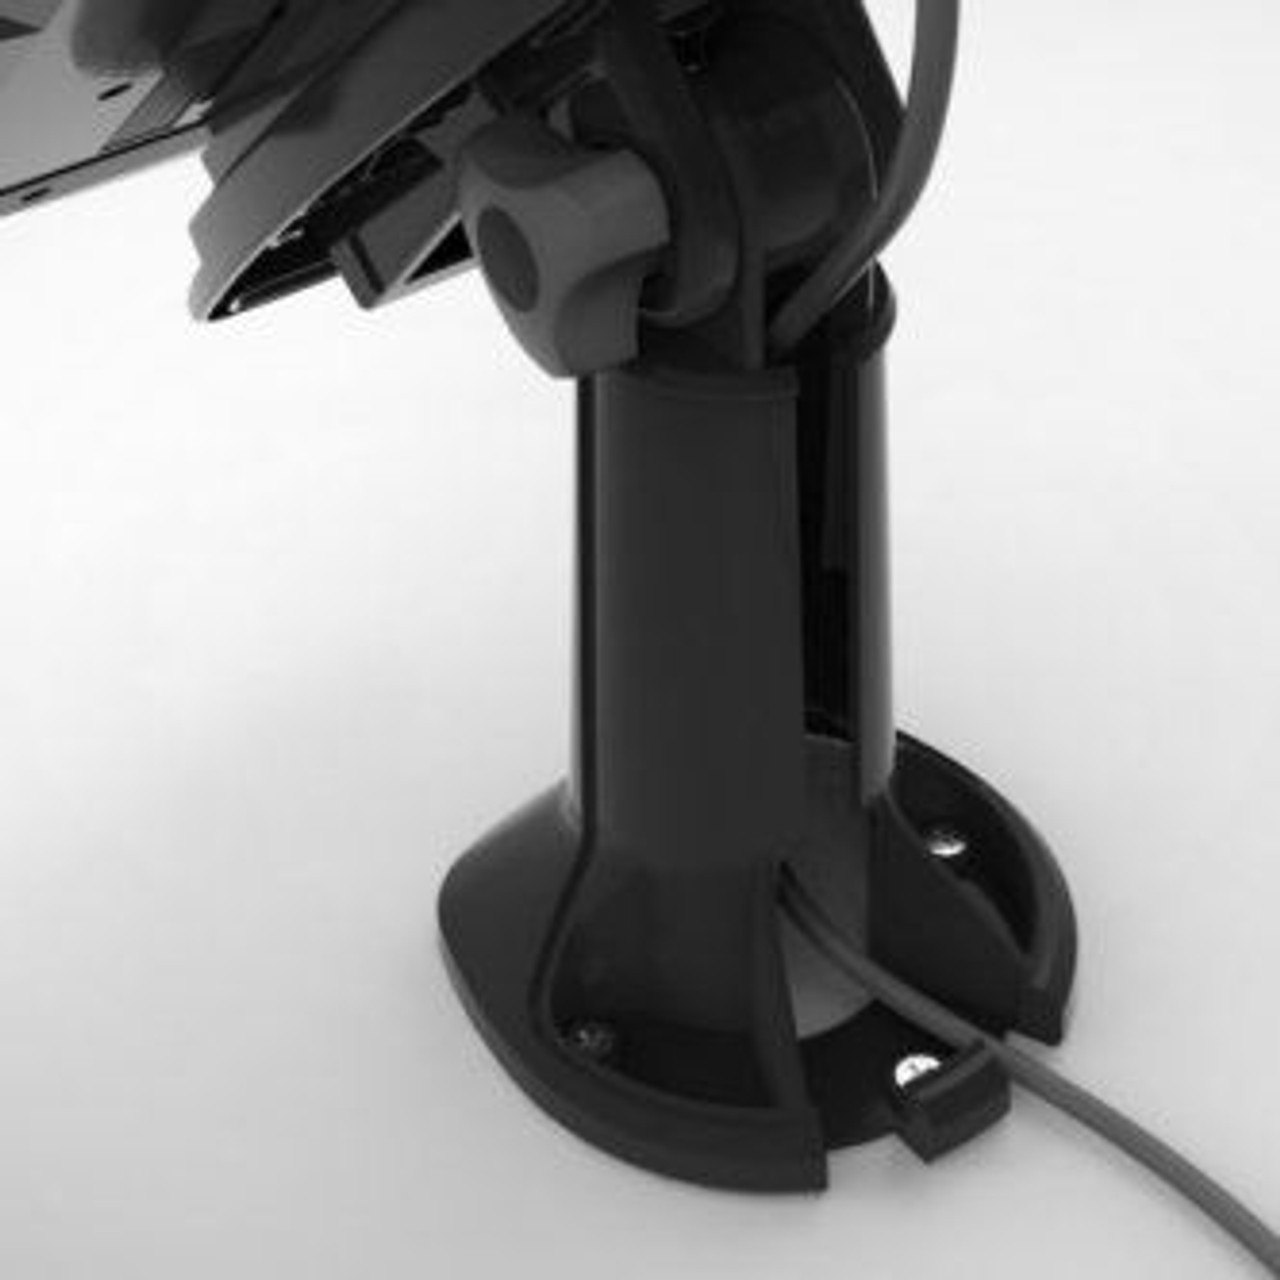 Ingenico iCT220 iCT250 Tailwind FlexiPole Plus Stand